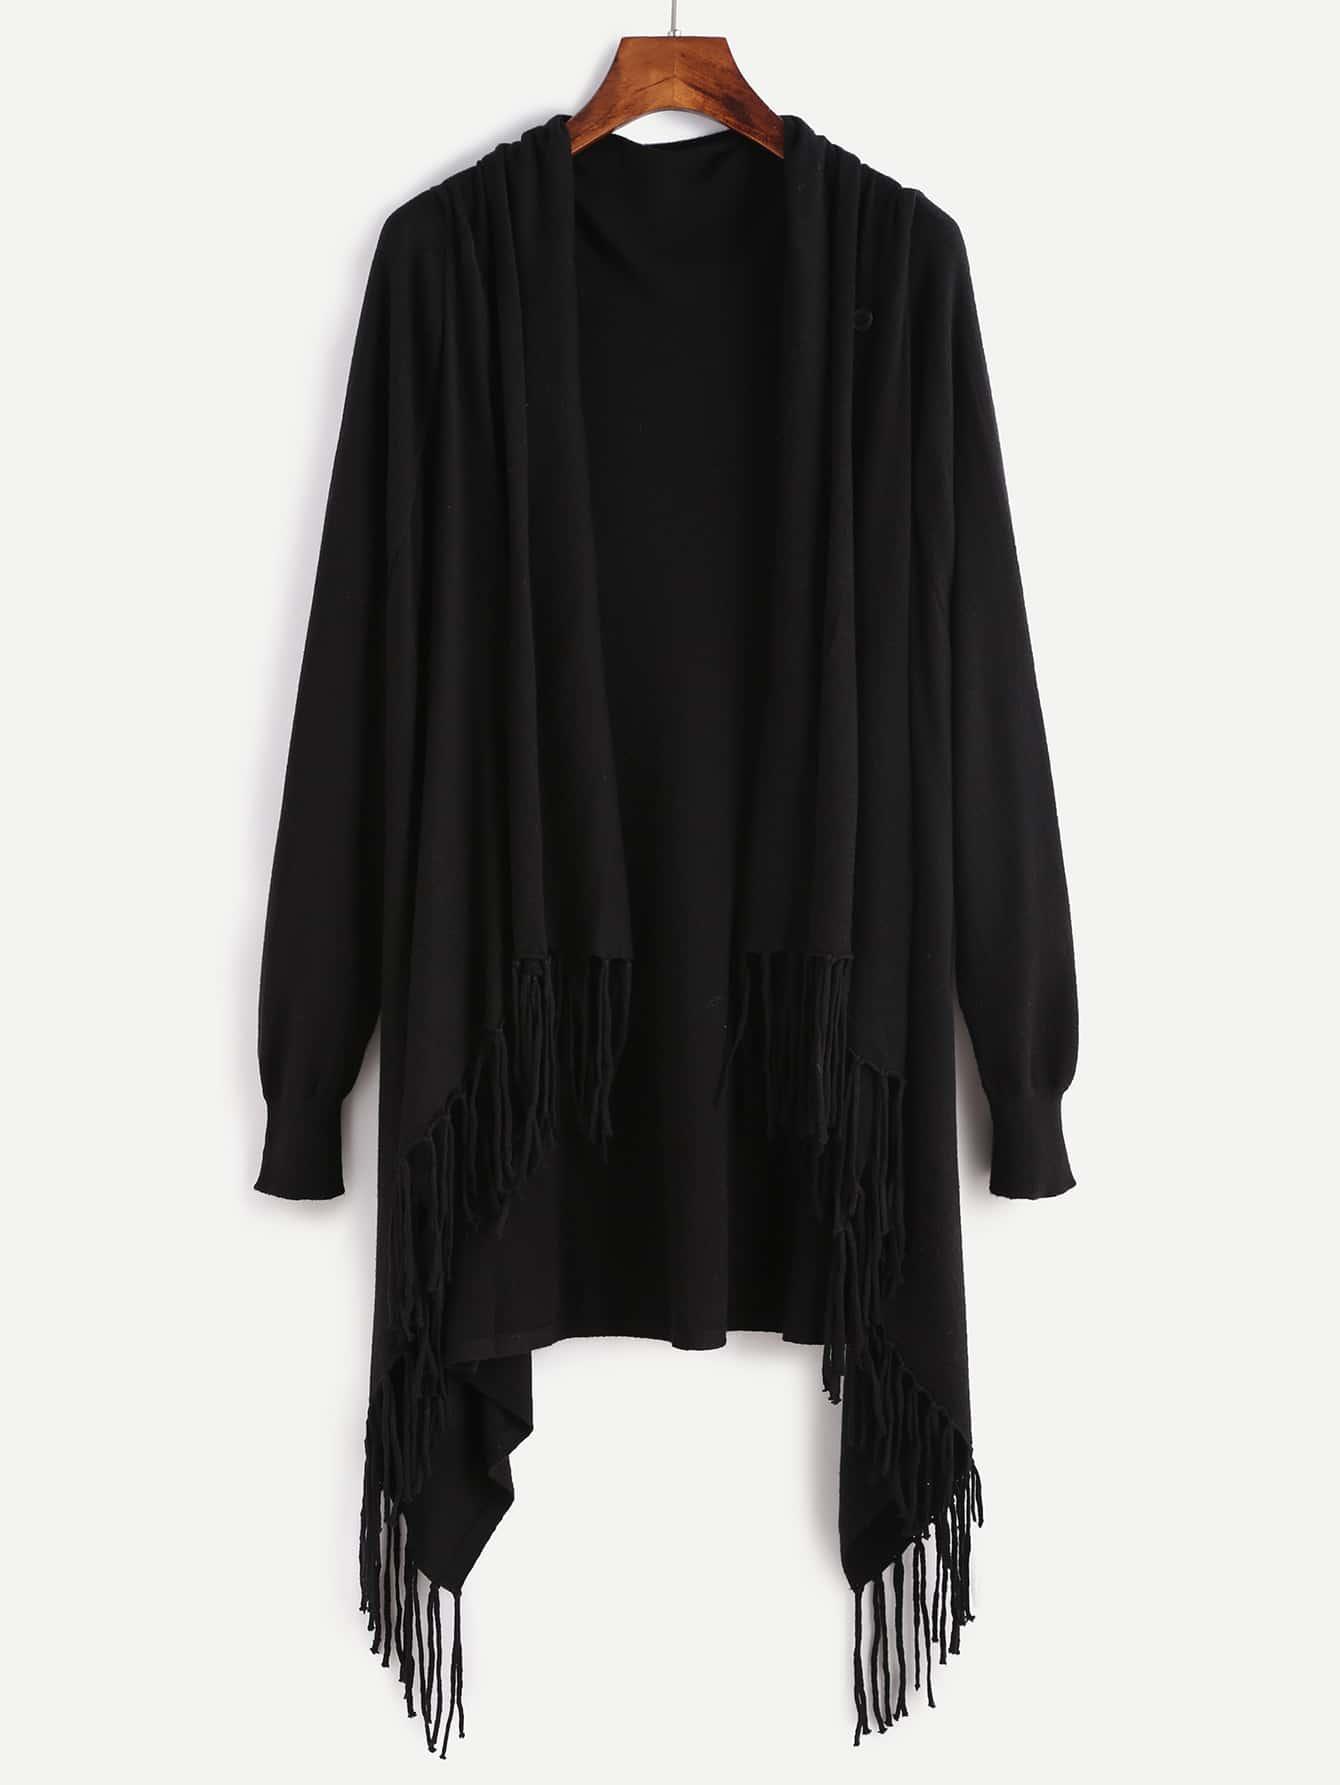 sweater160815706_2